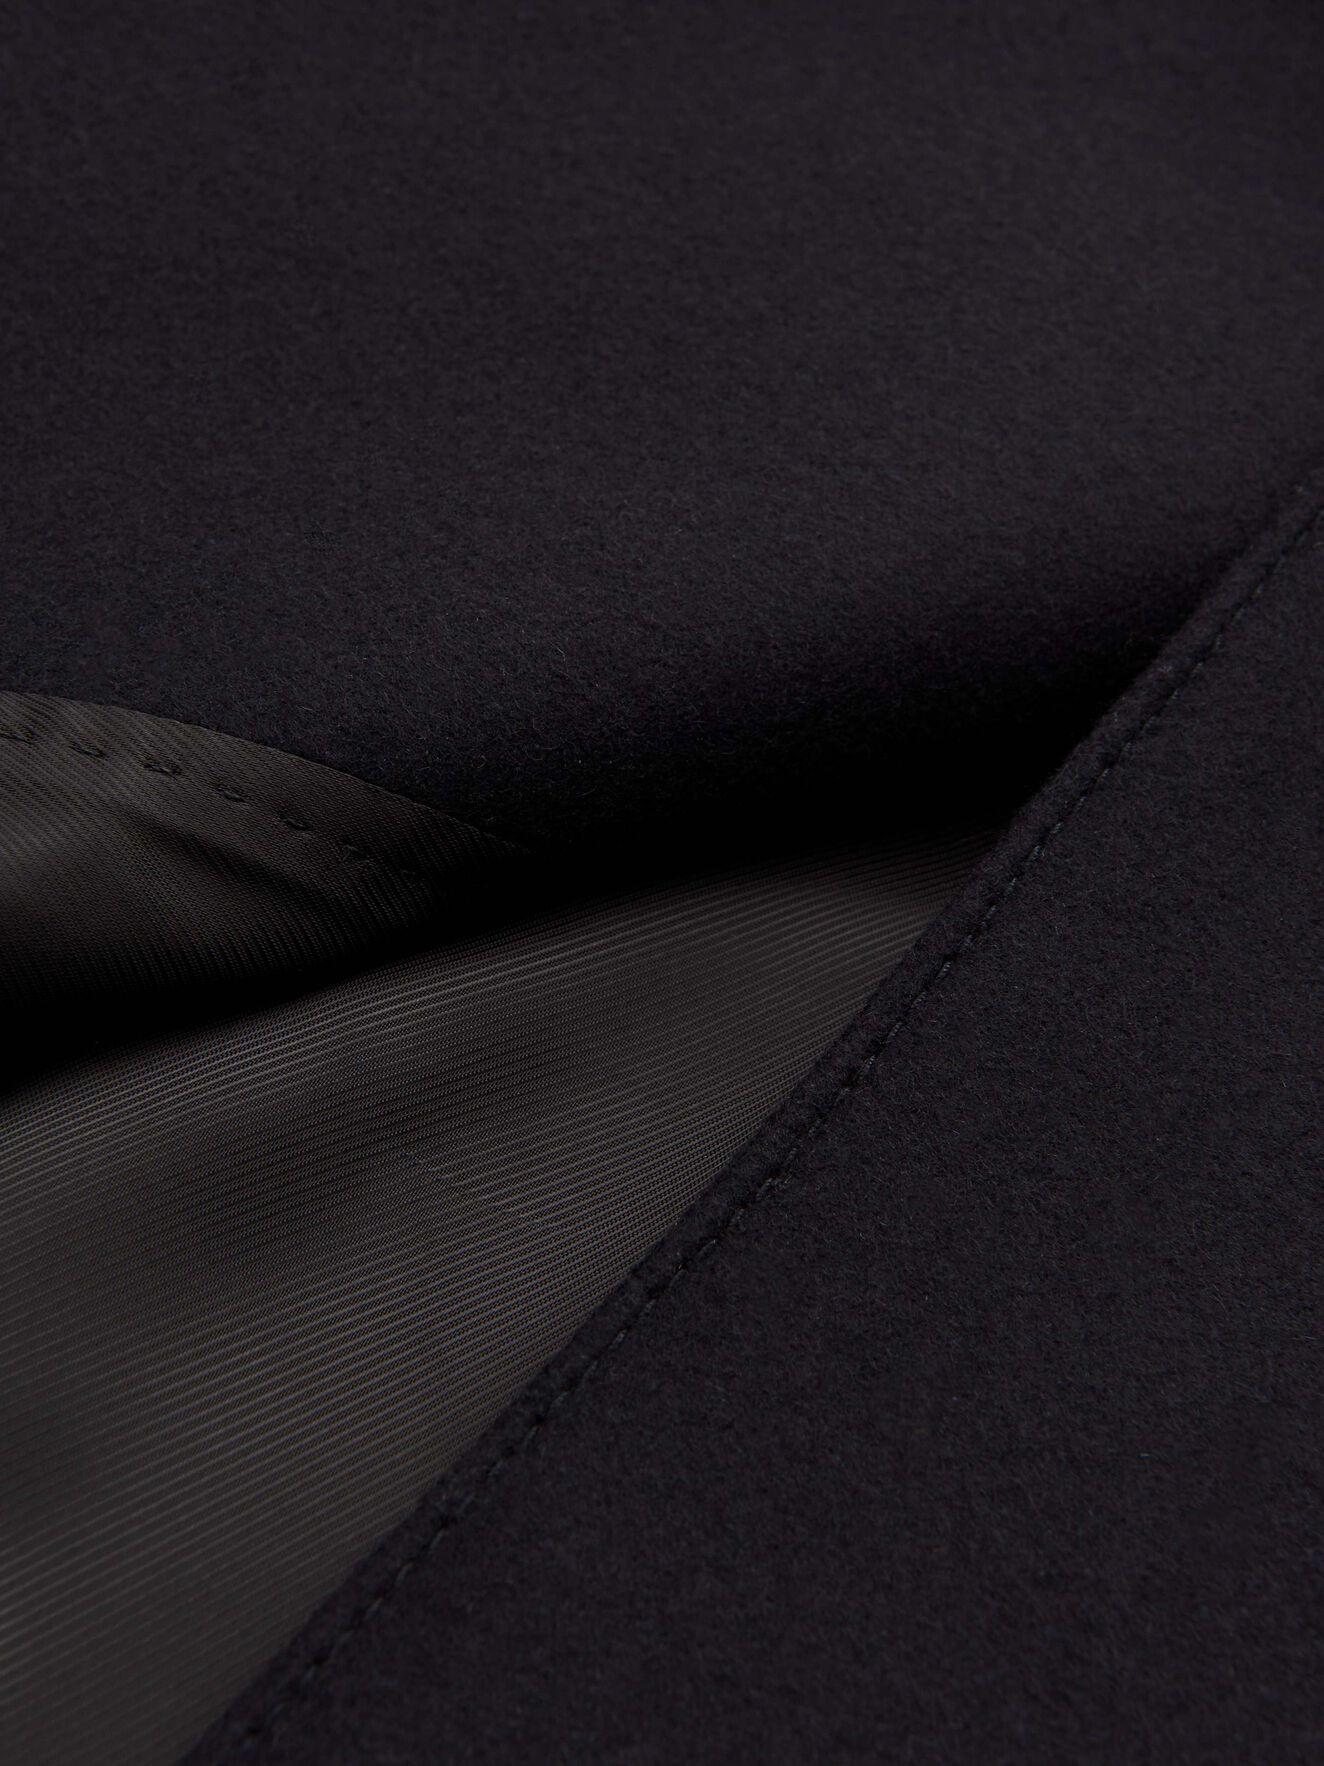 Cammel Coat in Dark Sea from Tiger of Sweden